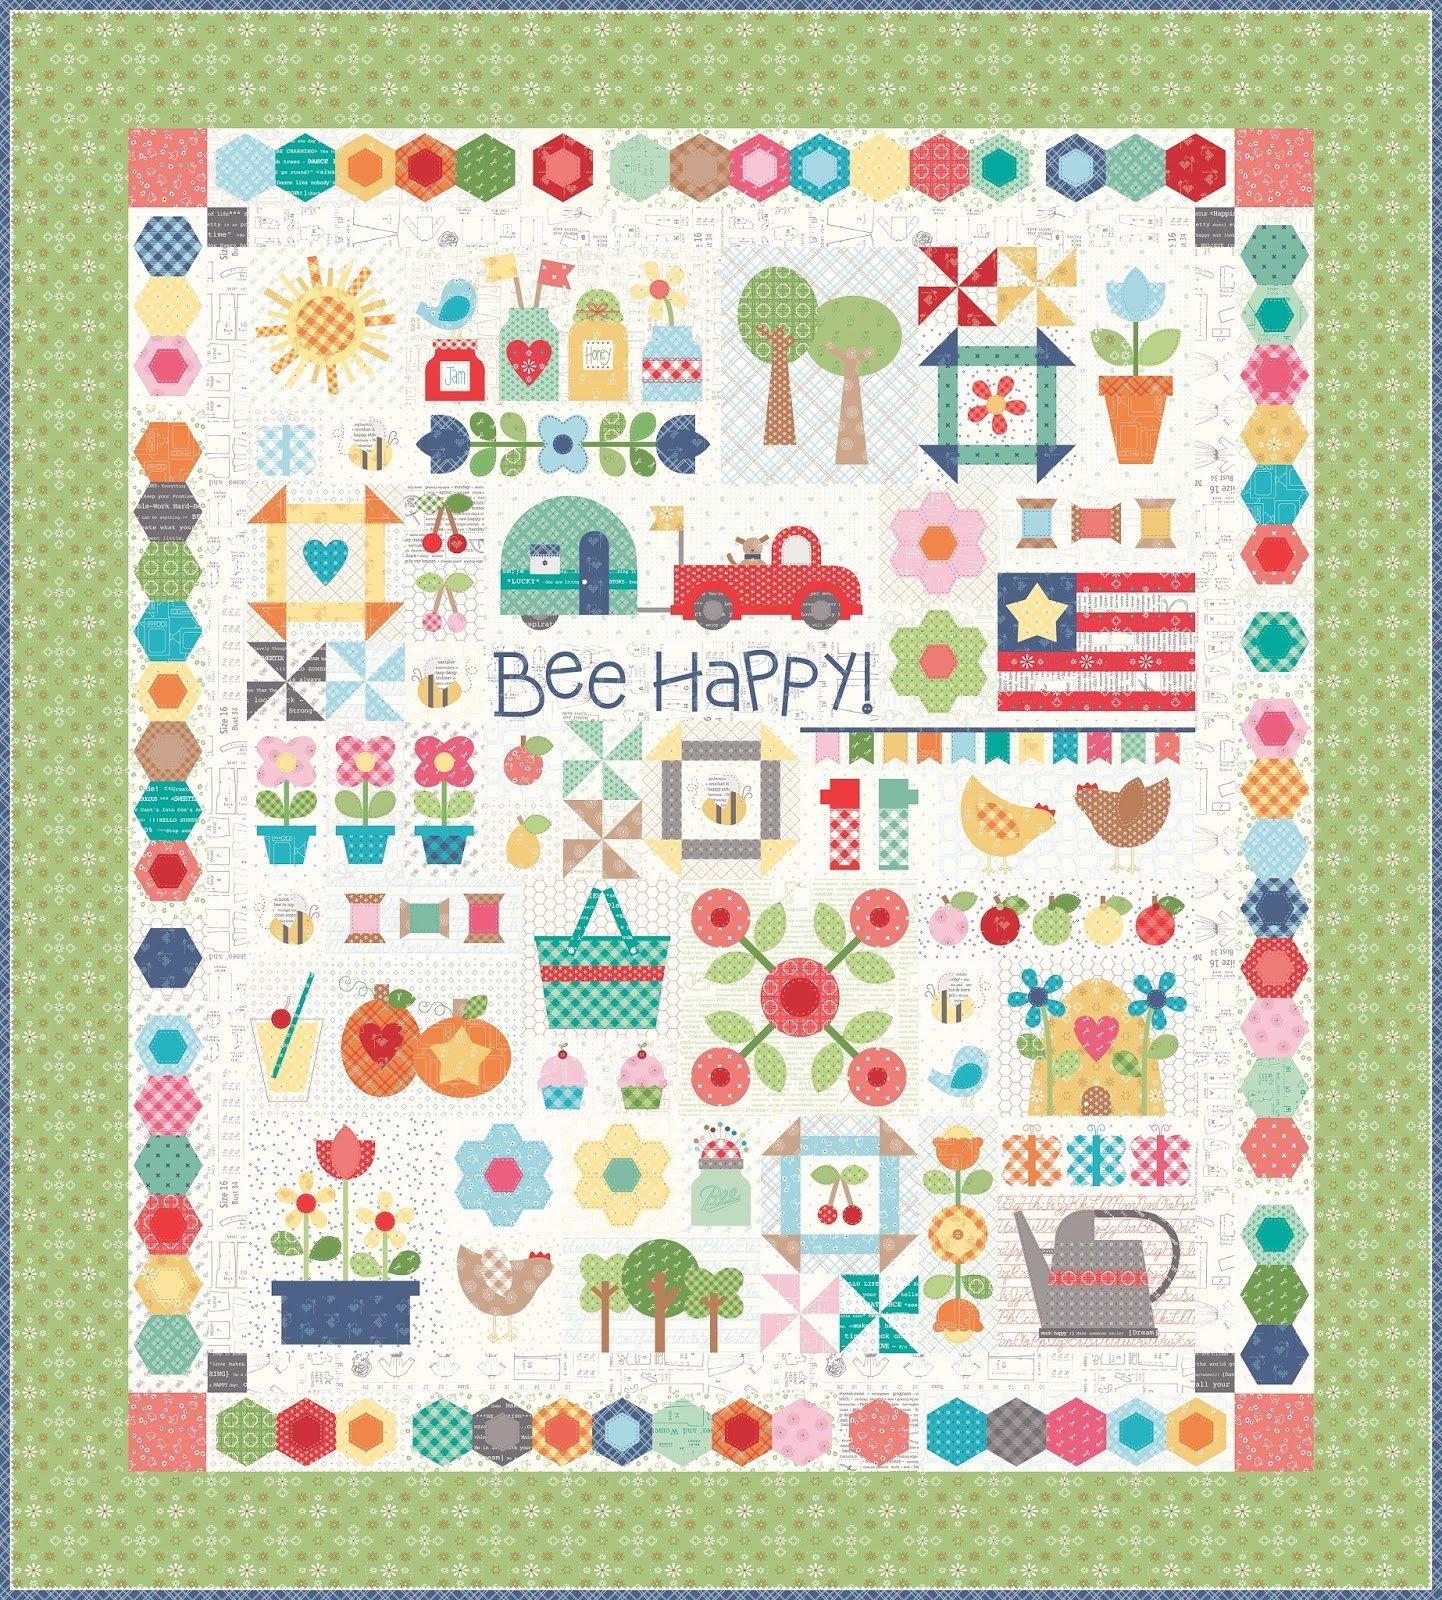 Bee Happy Sew Along Fabric Kit